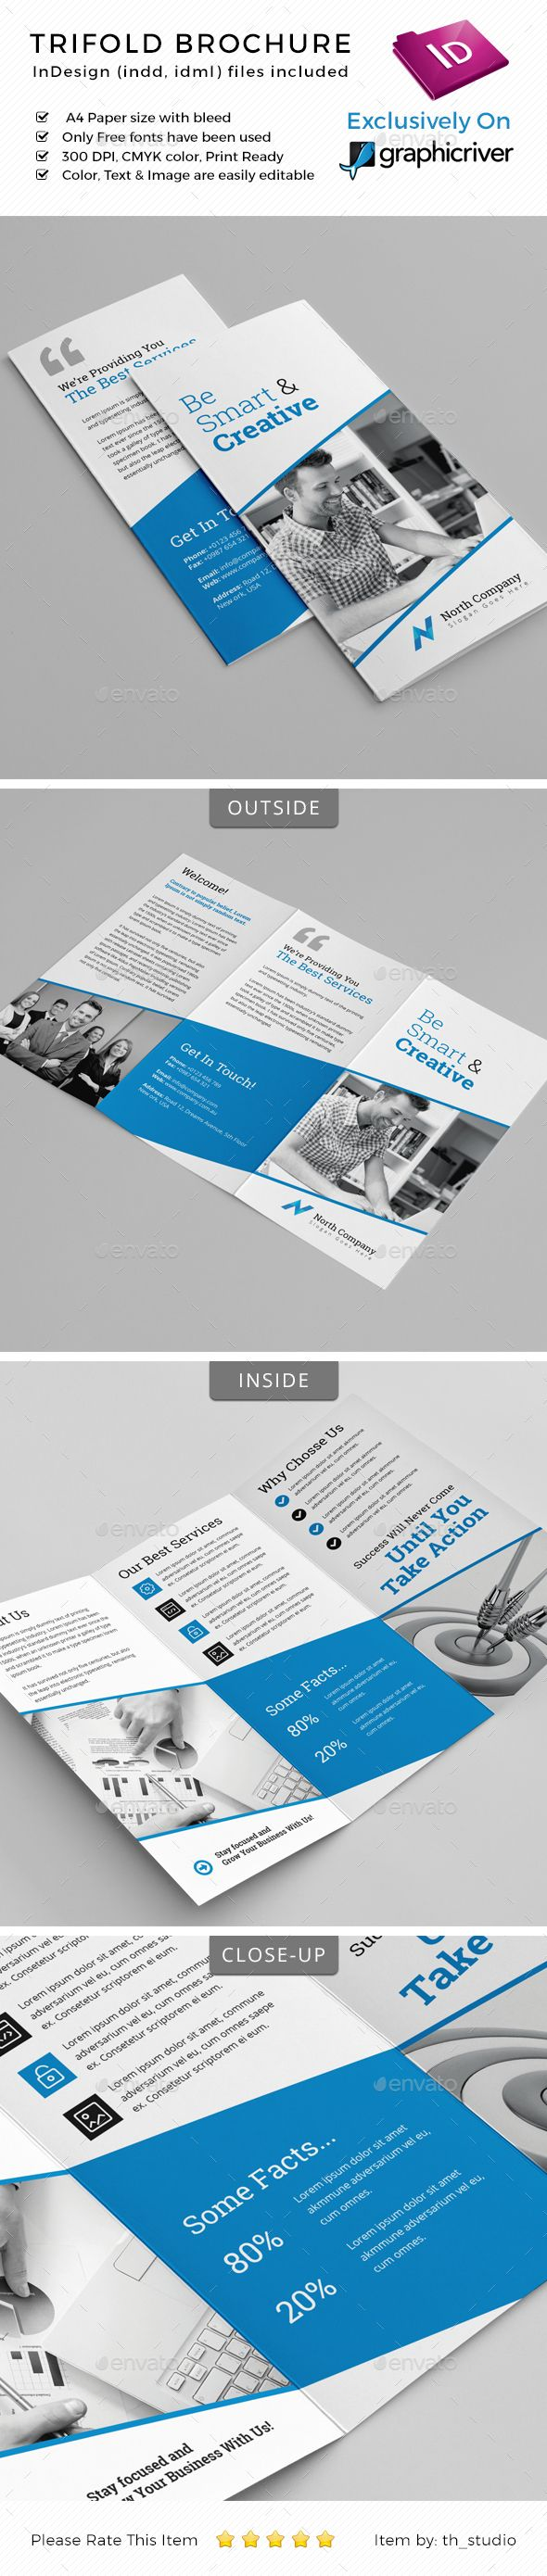 trifold brochure template tri fold design pinterest brochure